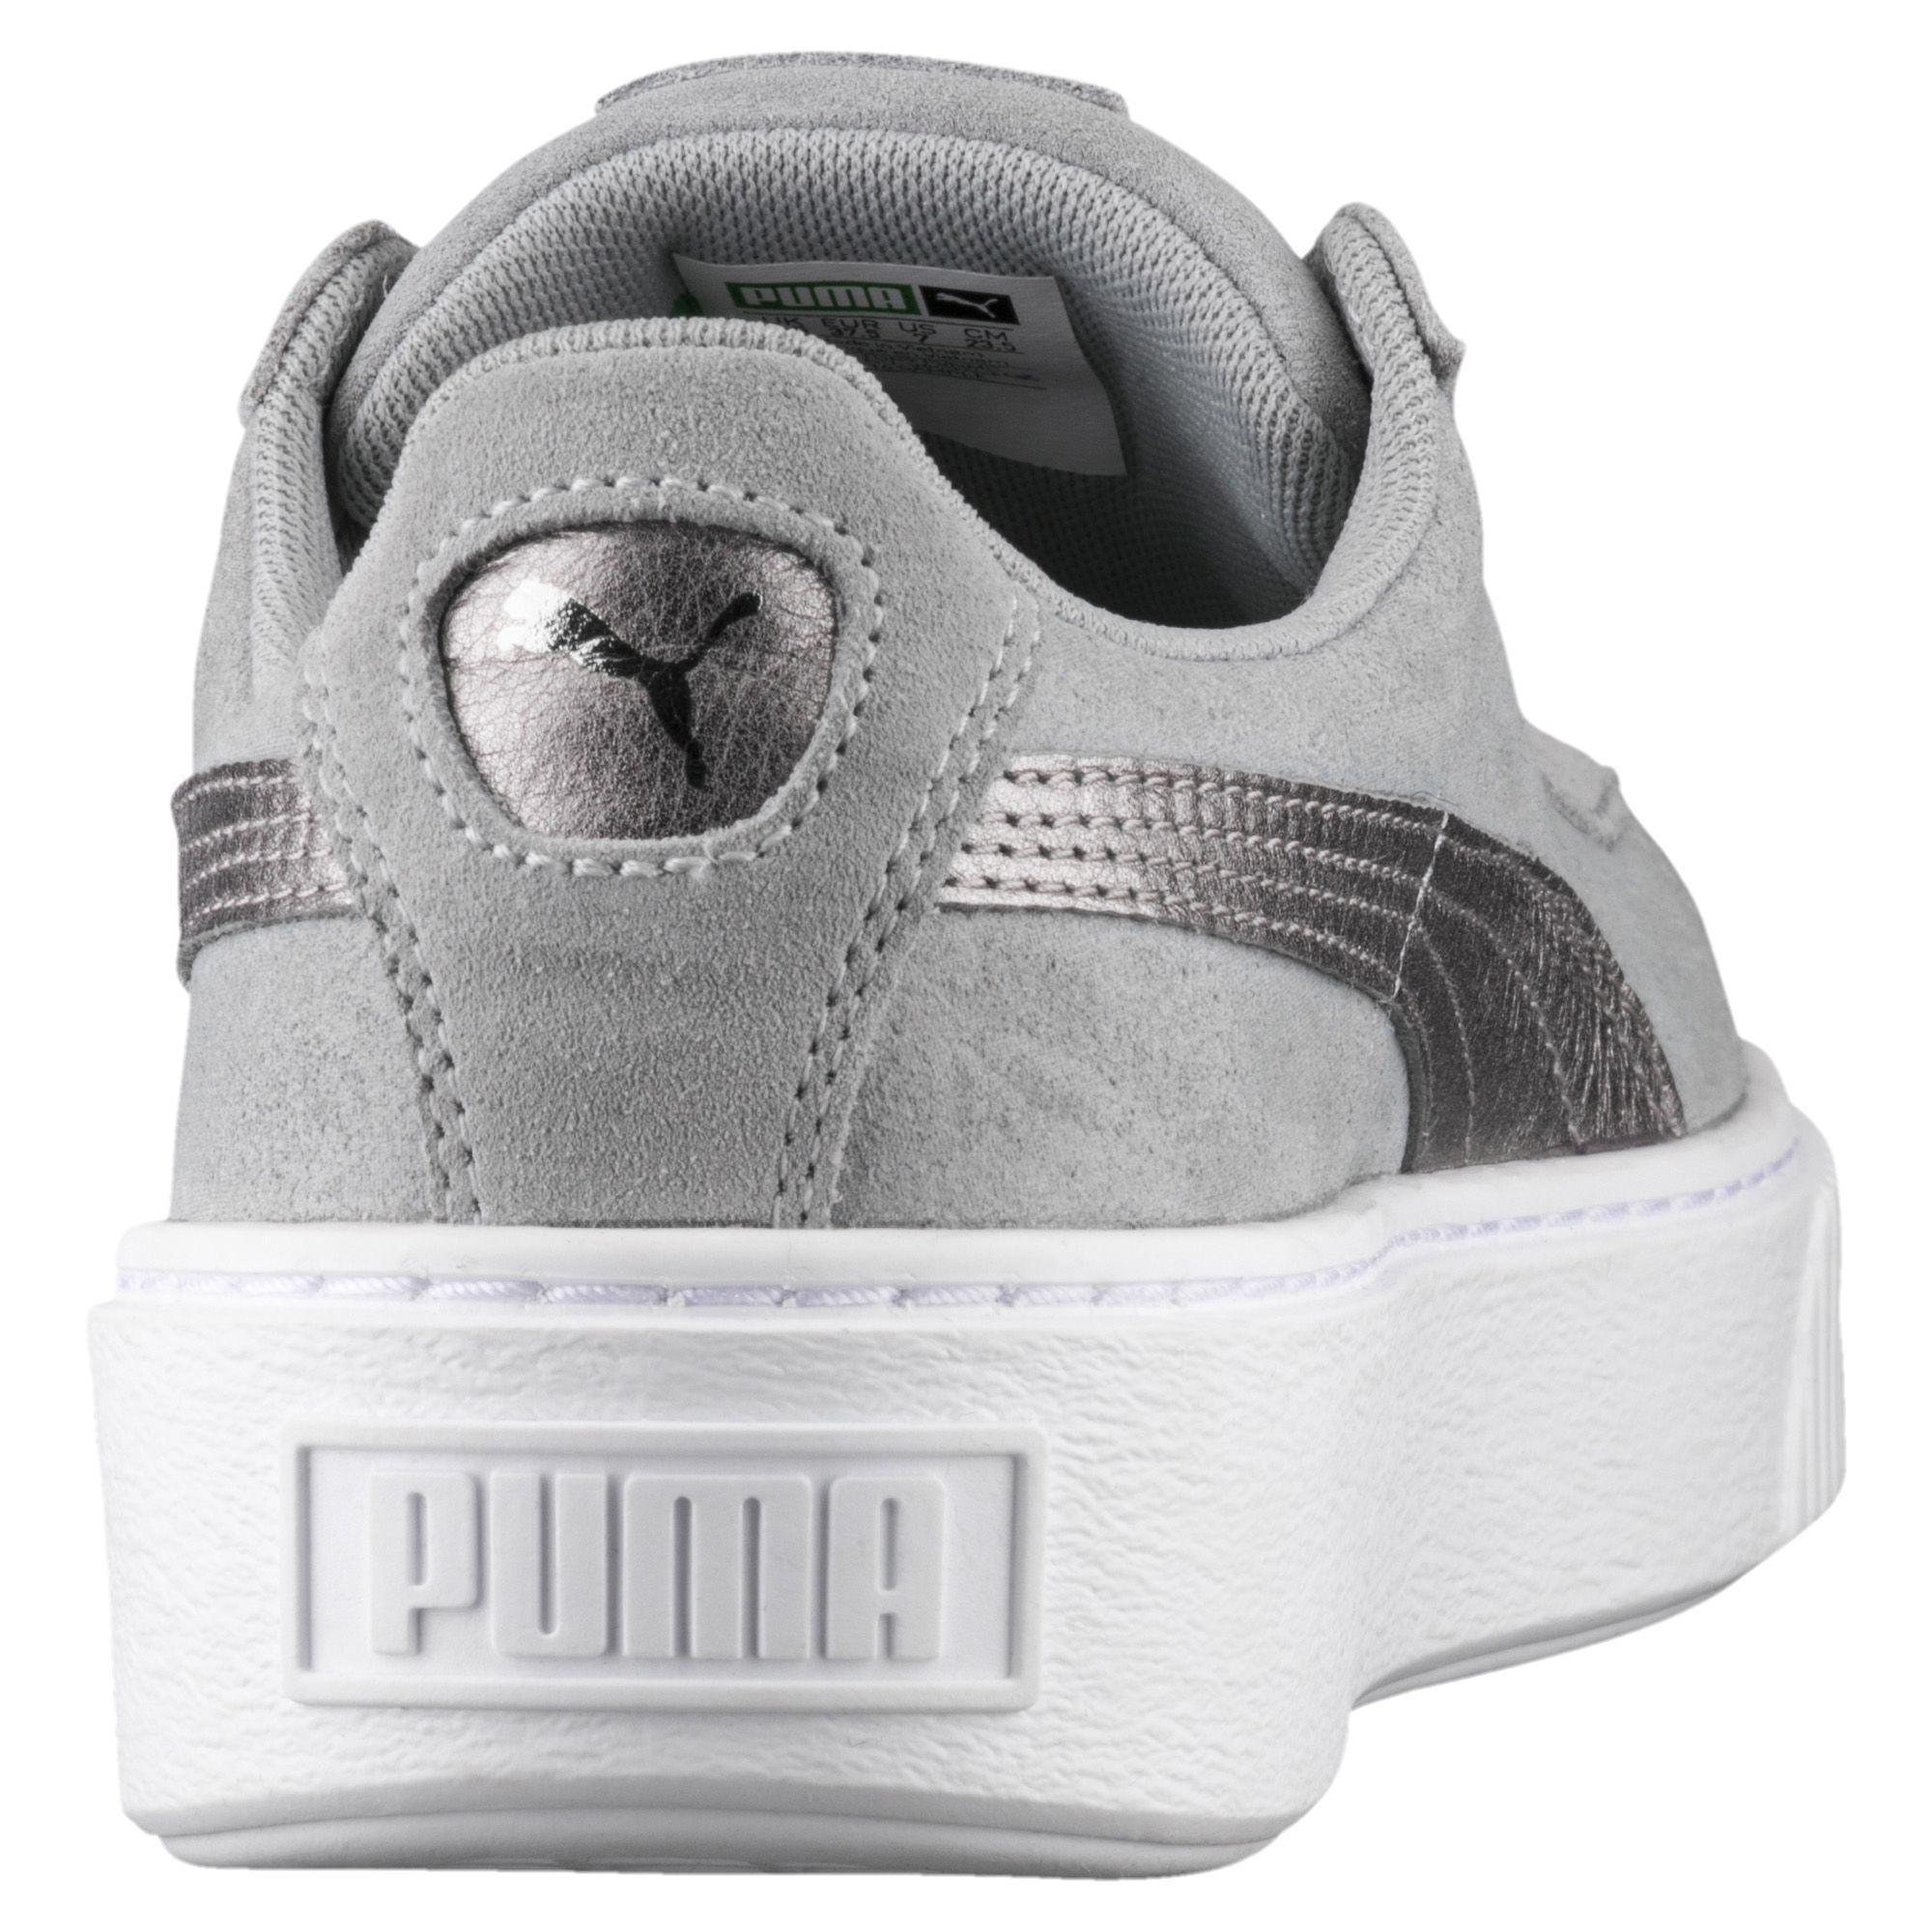 size 40 76d8c 4df55 PUMA Gray Suede Platform Metallic Safari Women's Sneakers